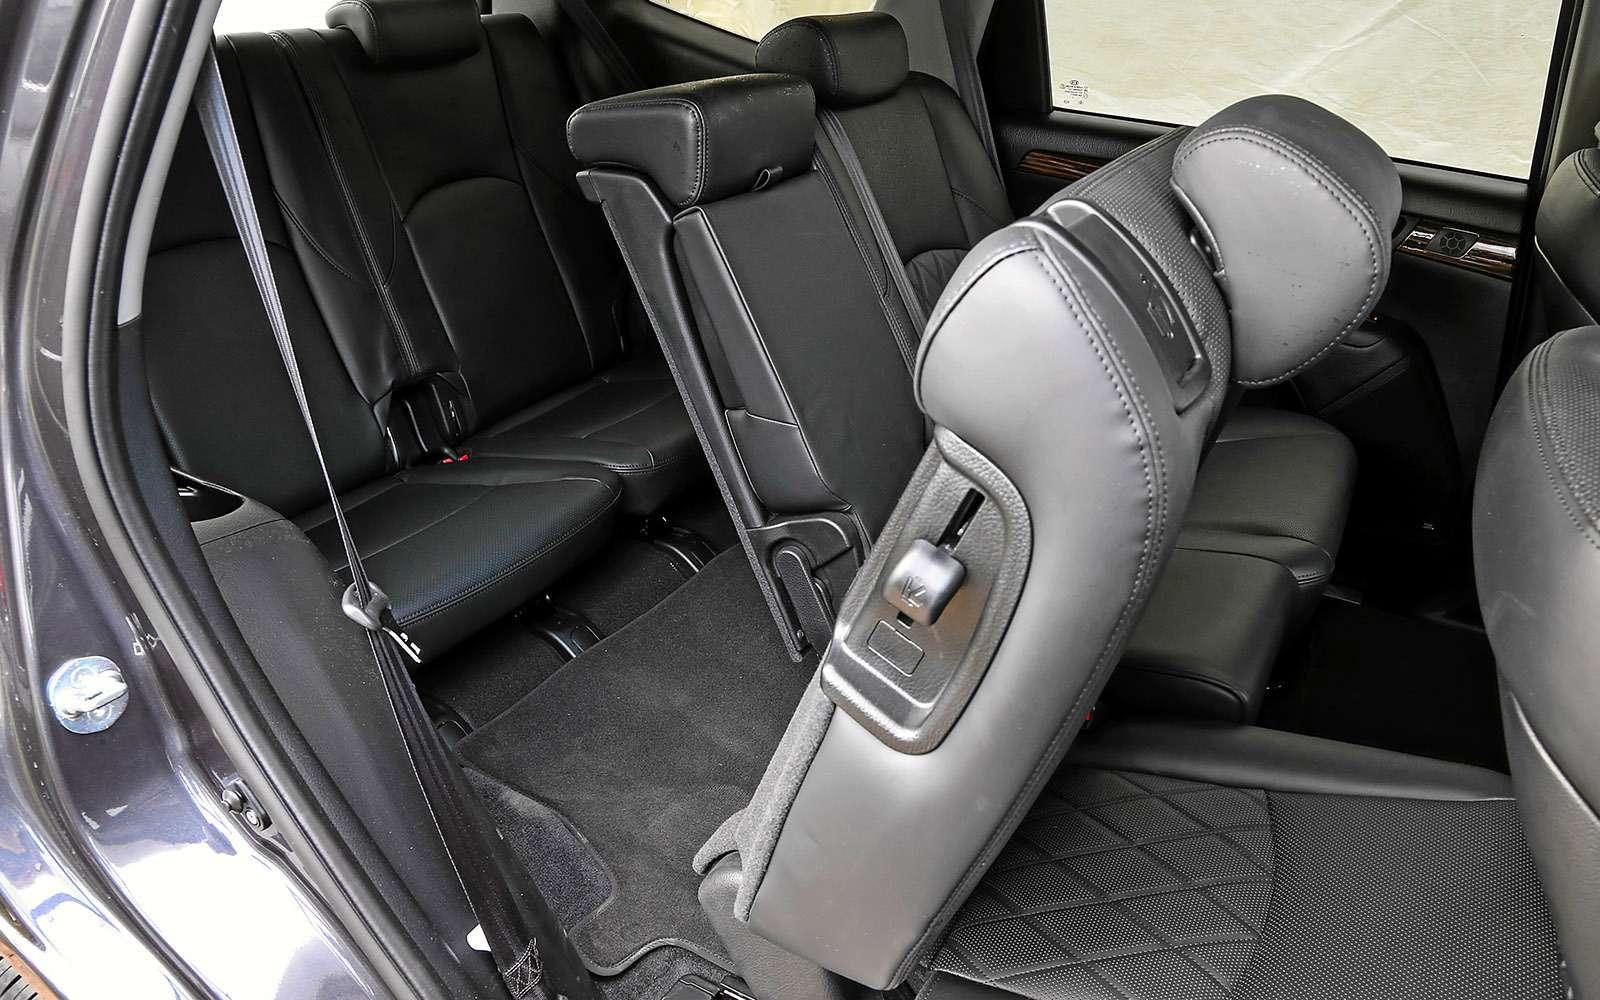 Mitsubishi Pajero Sport иKia Mohave— сравнительный тест настоящих внедорожников— фото 769893